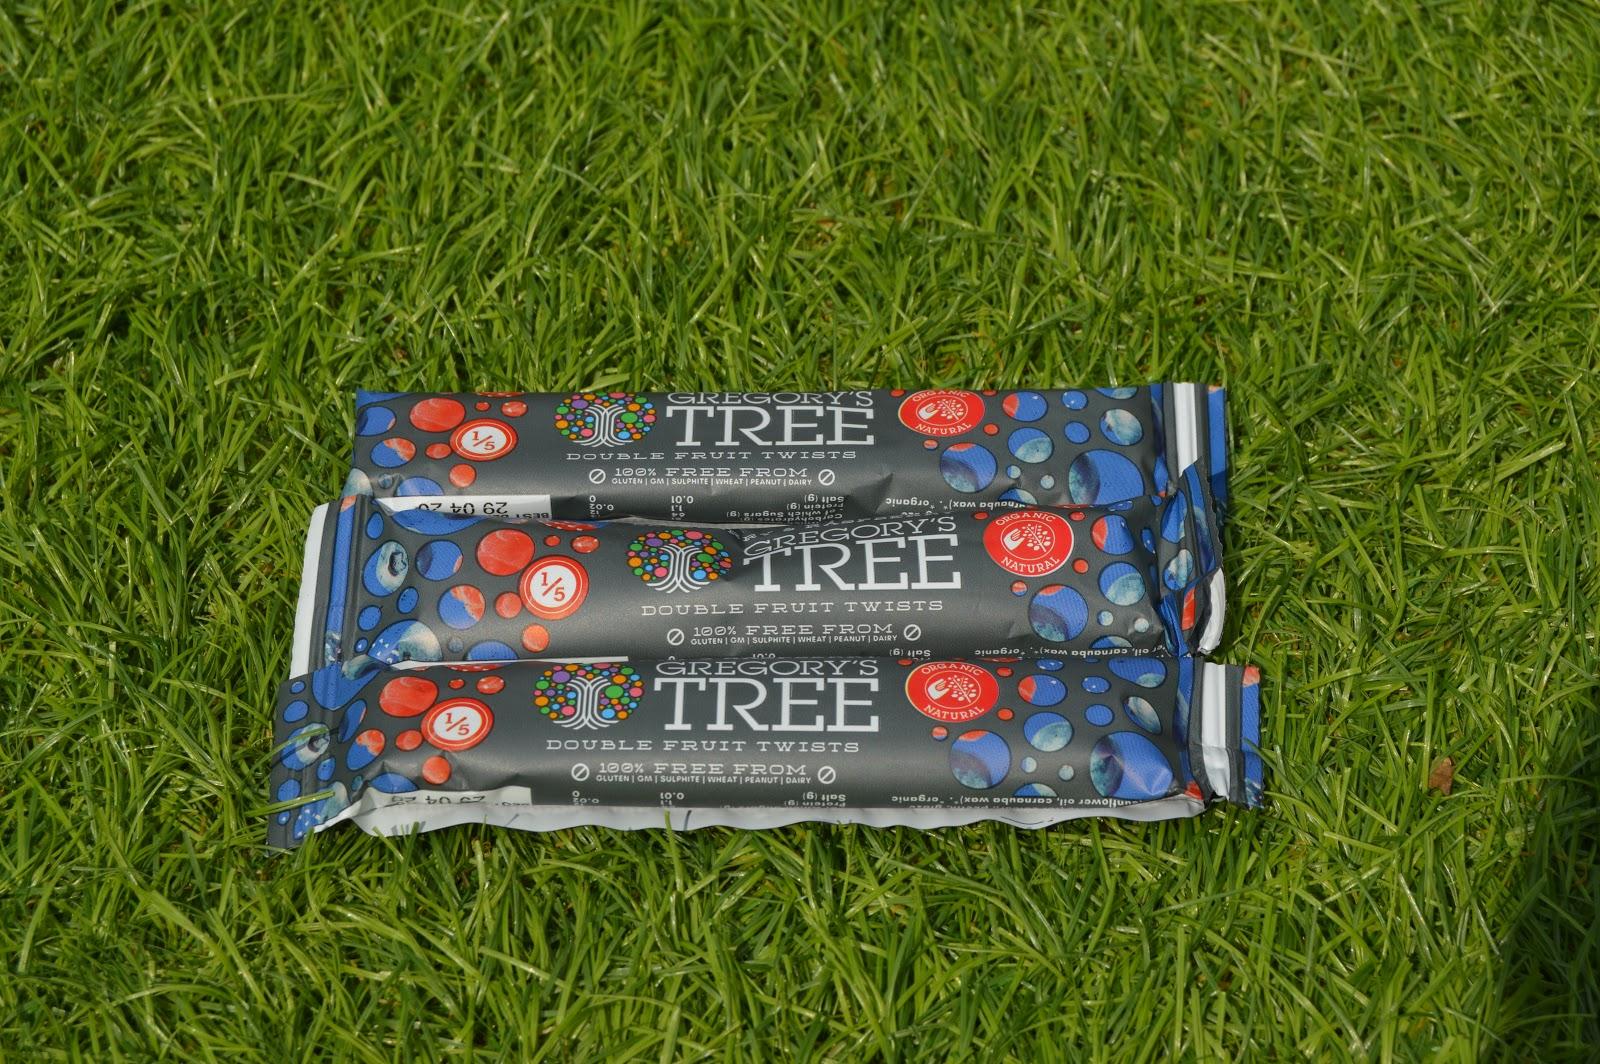 Gregory's tree bars